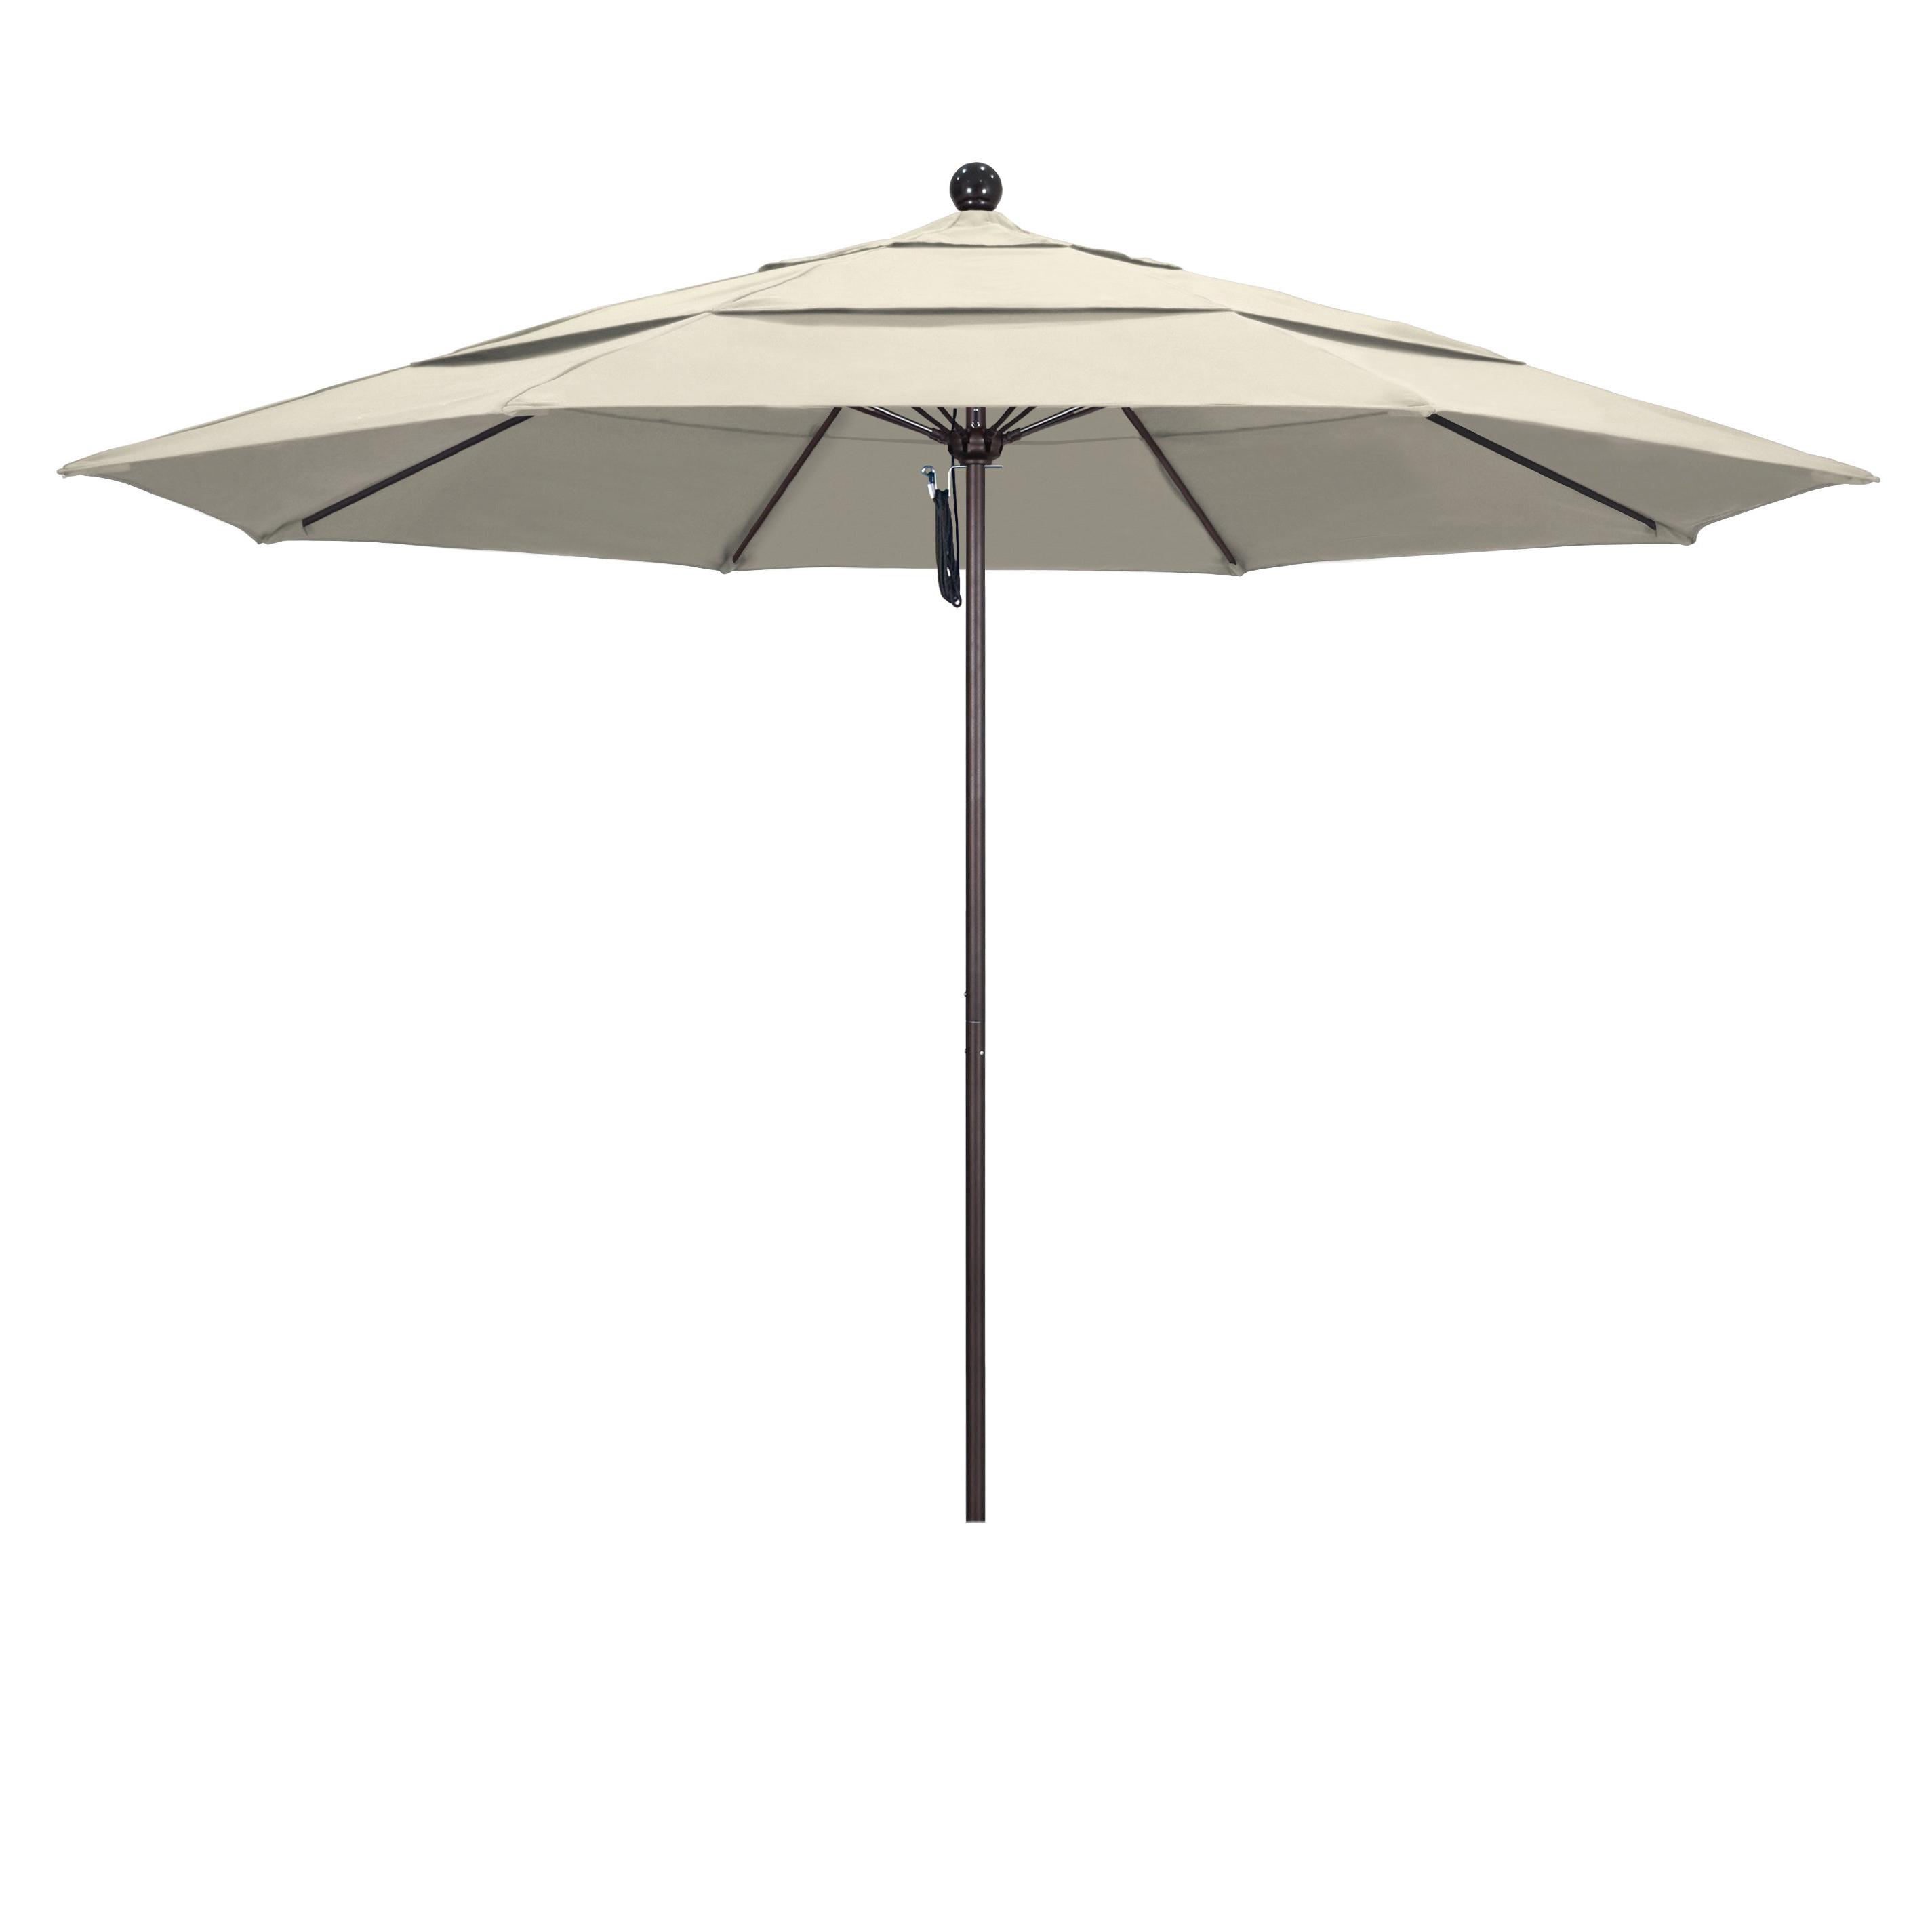 Launceston Market Umbrellas In Popular Duxbury 11' Market Umbrella (View 7 of 20)